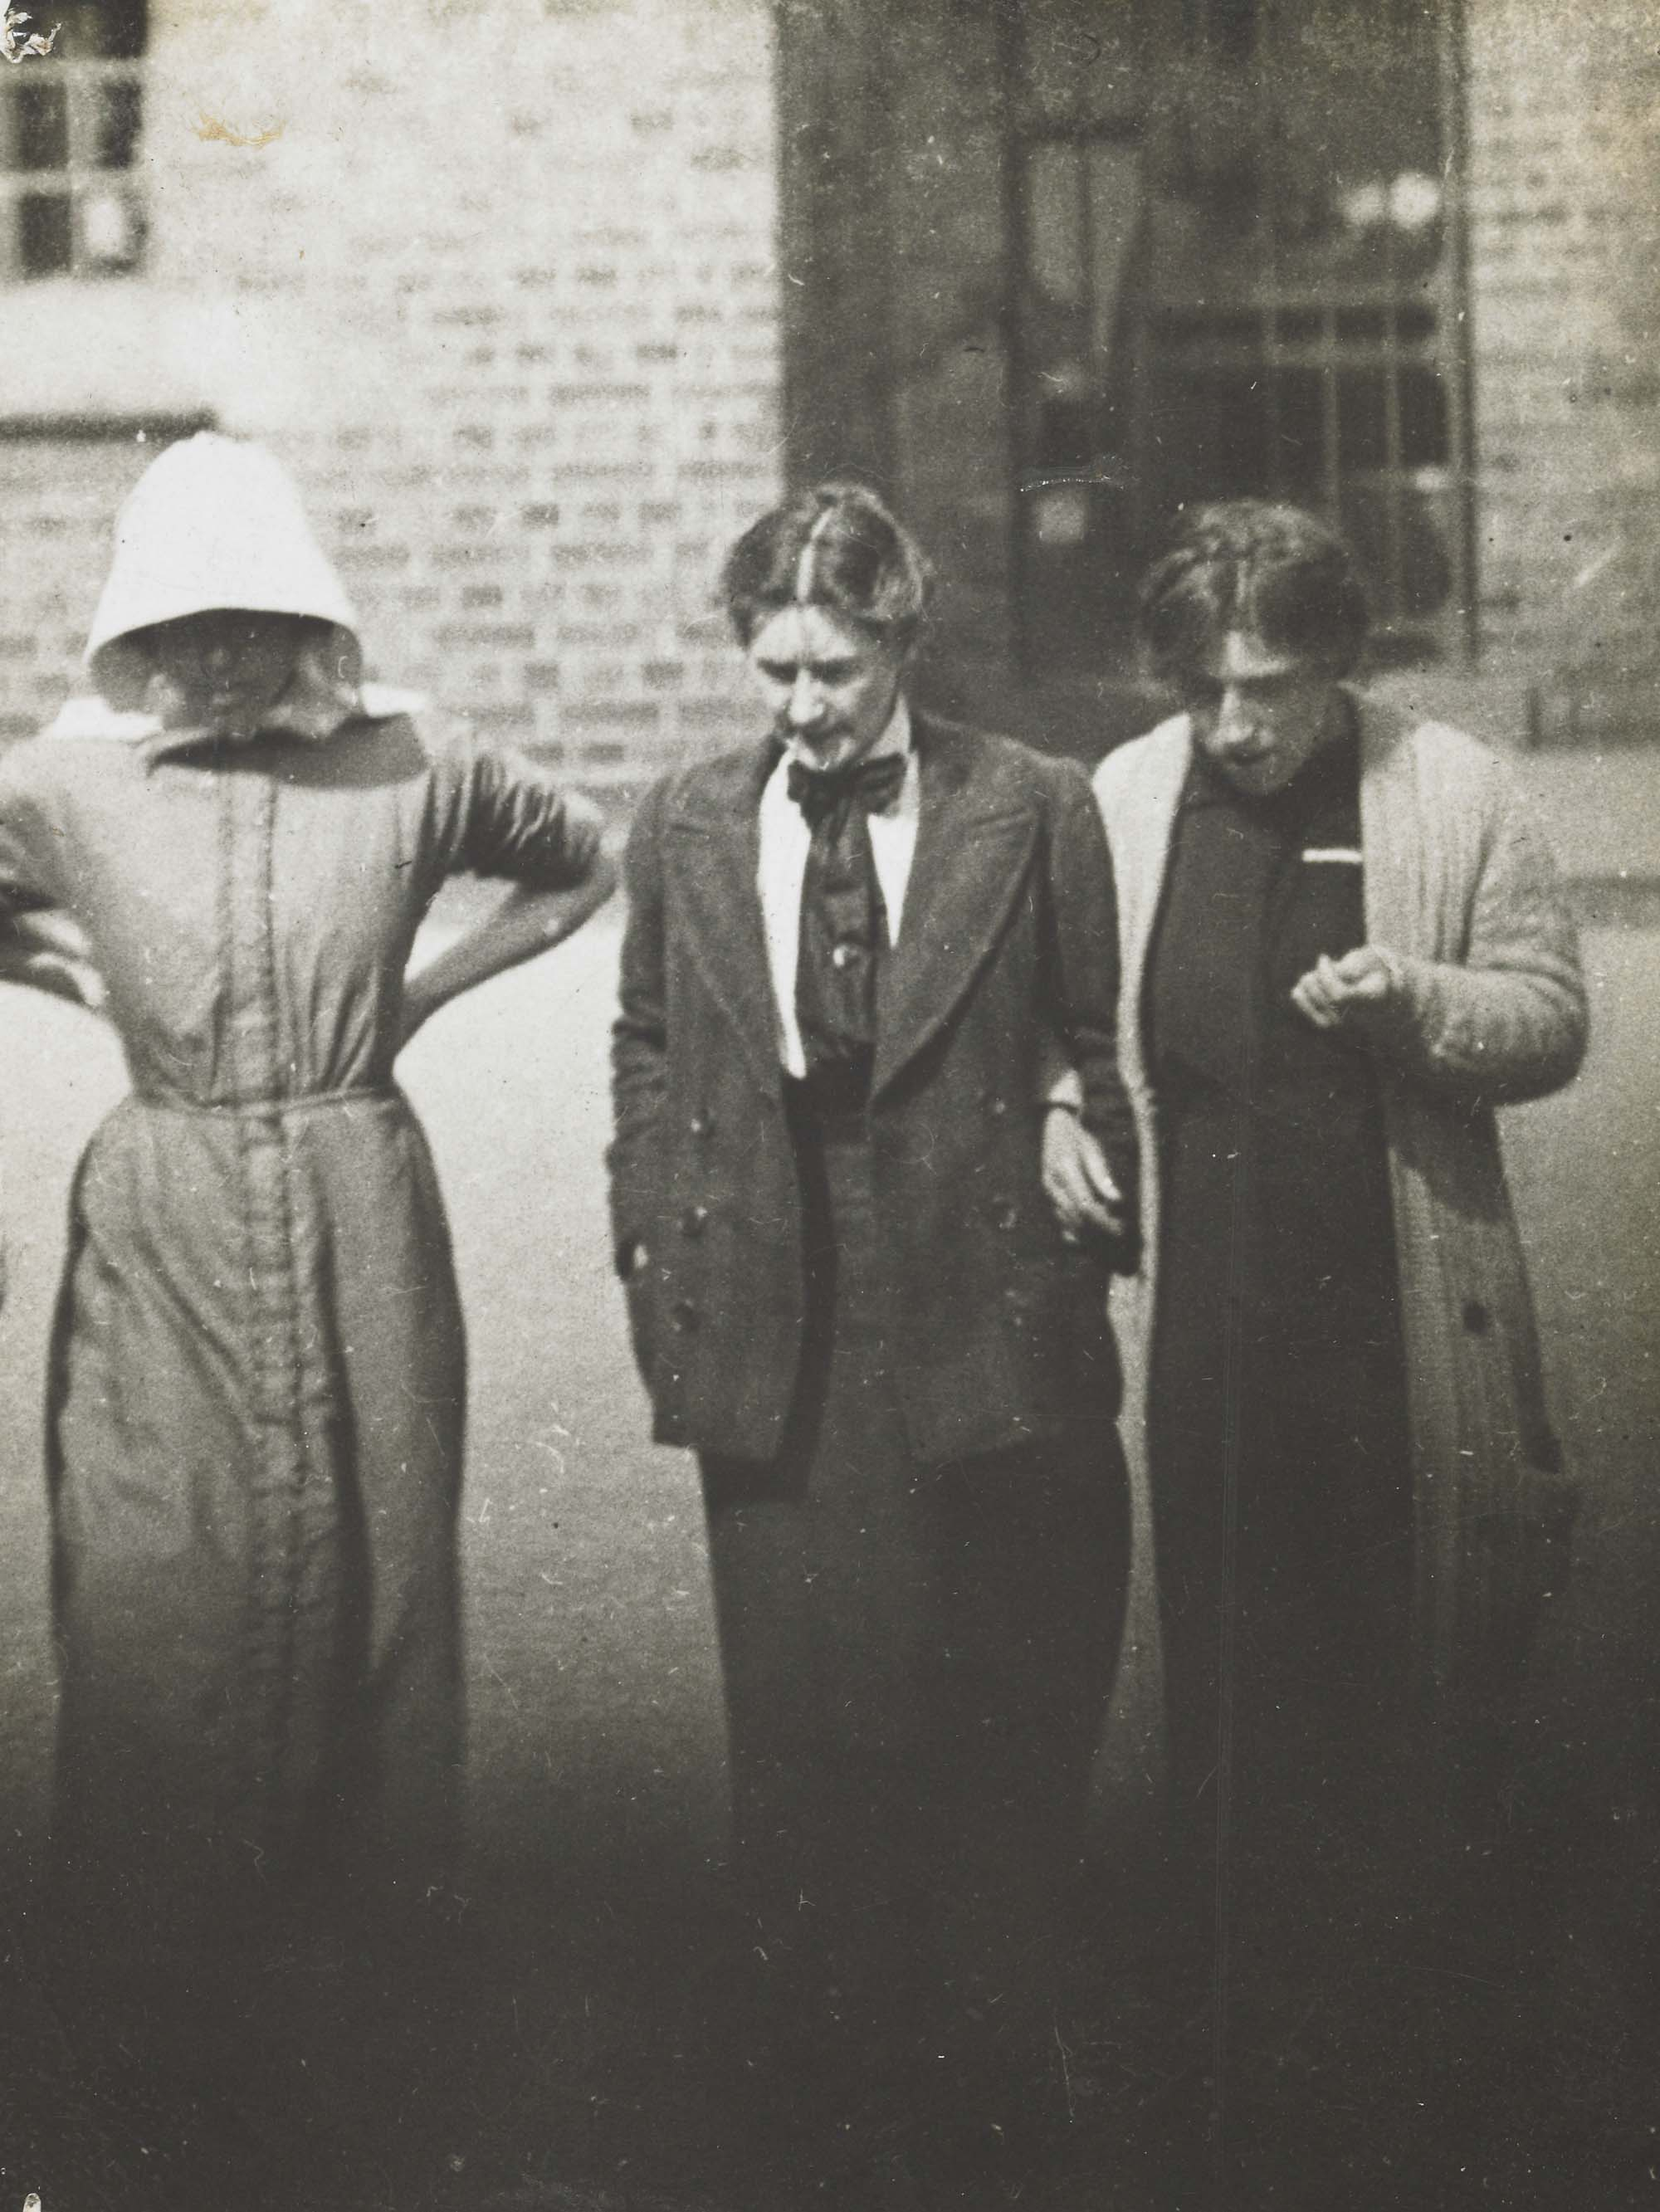 a photograph of three women in Edwardian dress walking across a yard